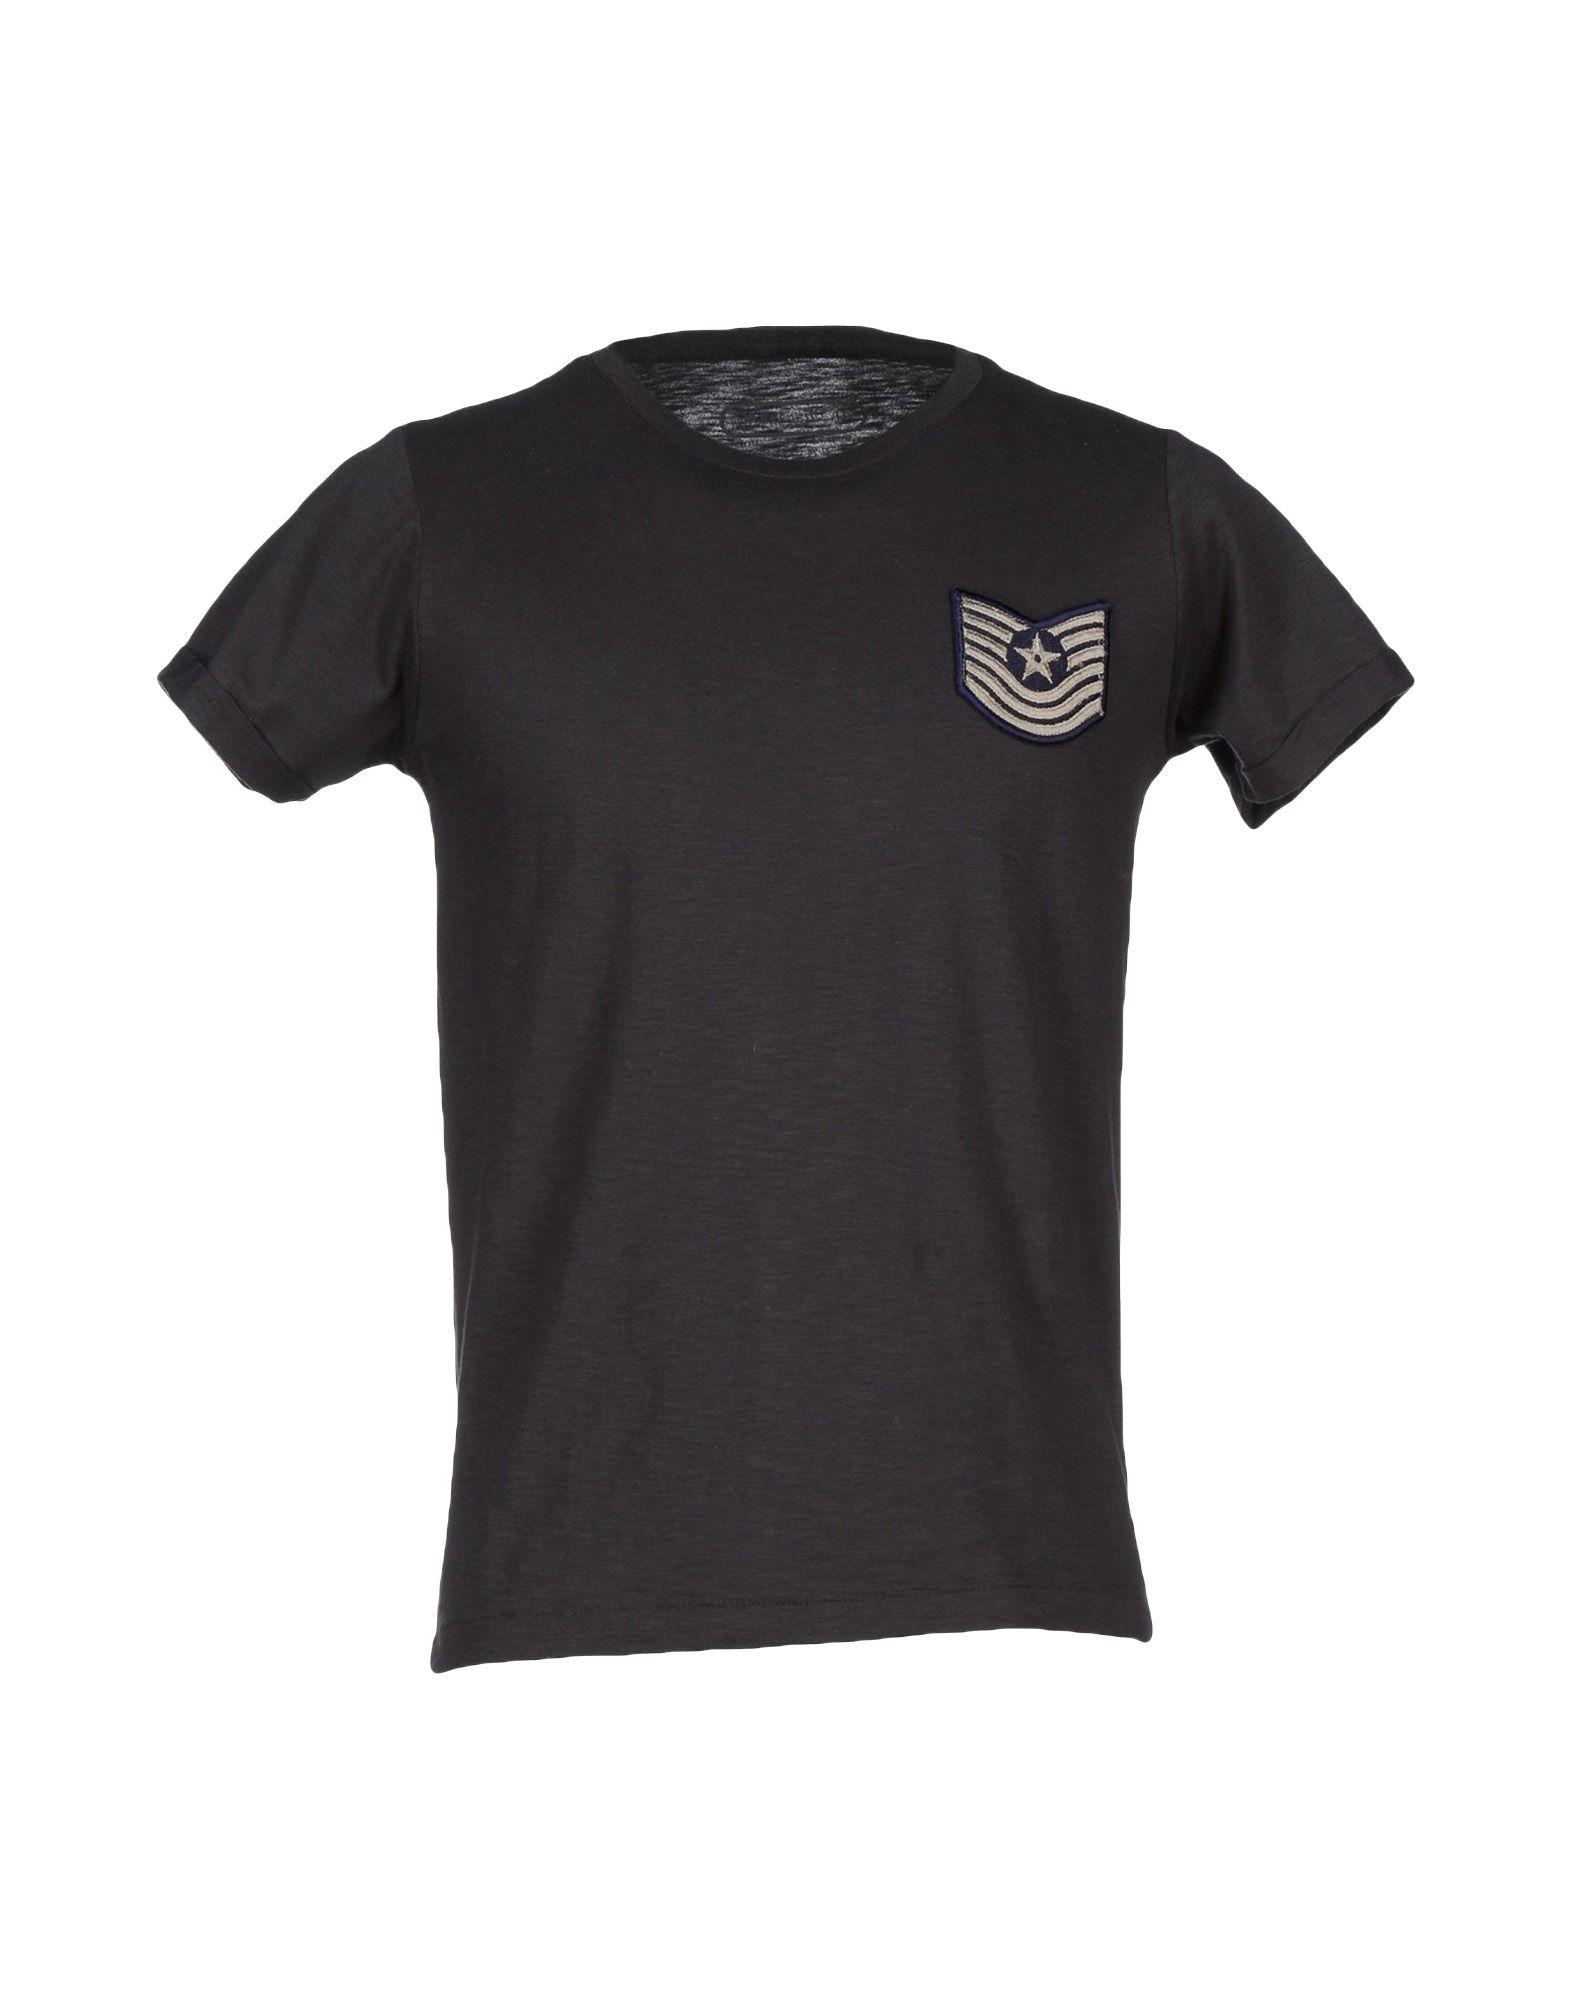 SMARTNESS LAB Футболка t lab футболка t lab модель 2757884